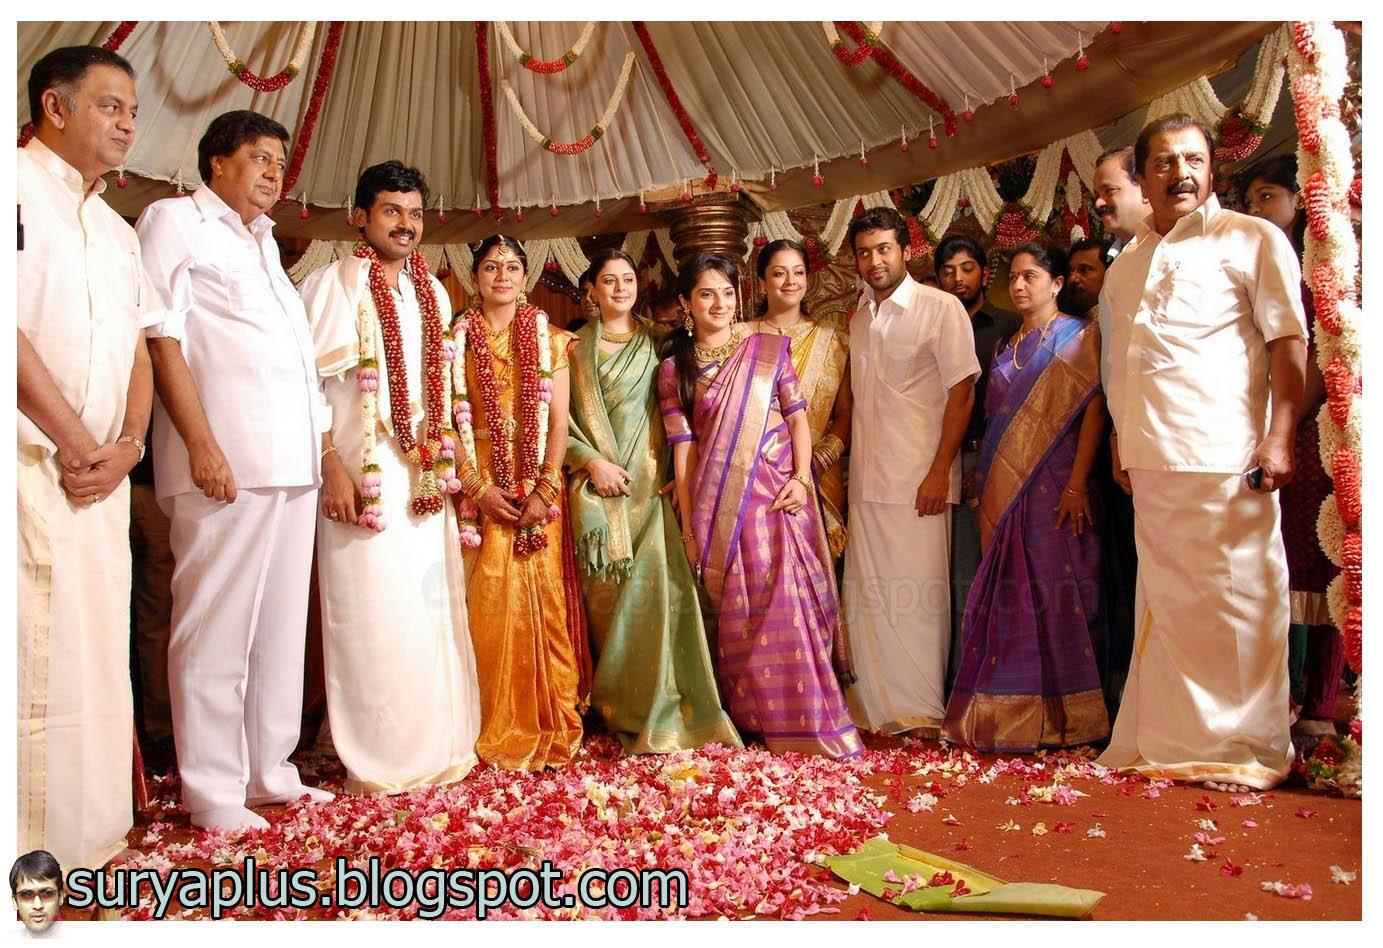 Large Hd Photo Of Karthi Wedding CLICK TO ENLARGE